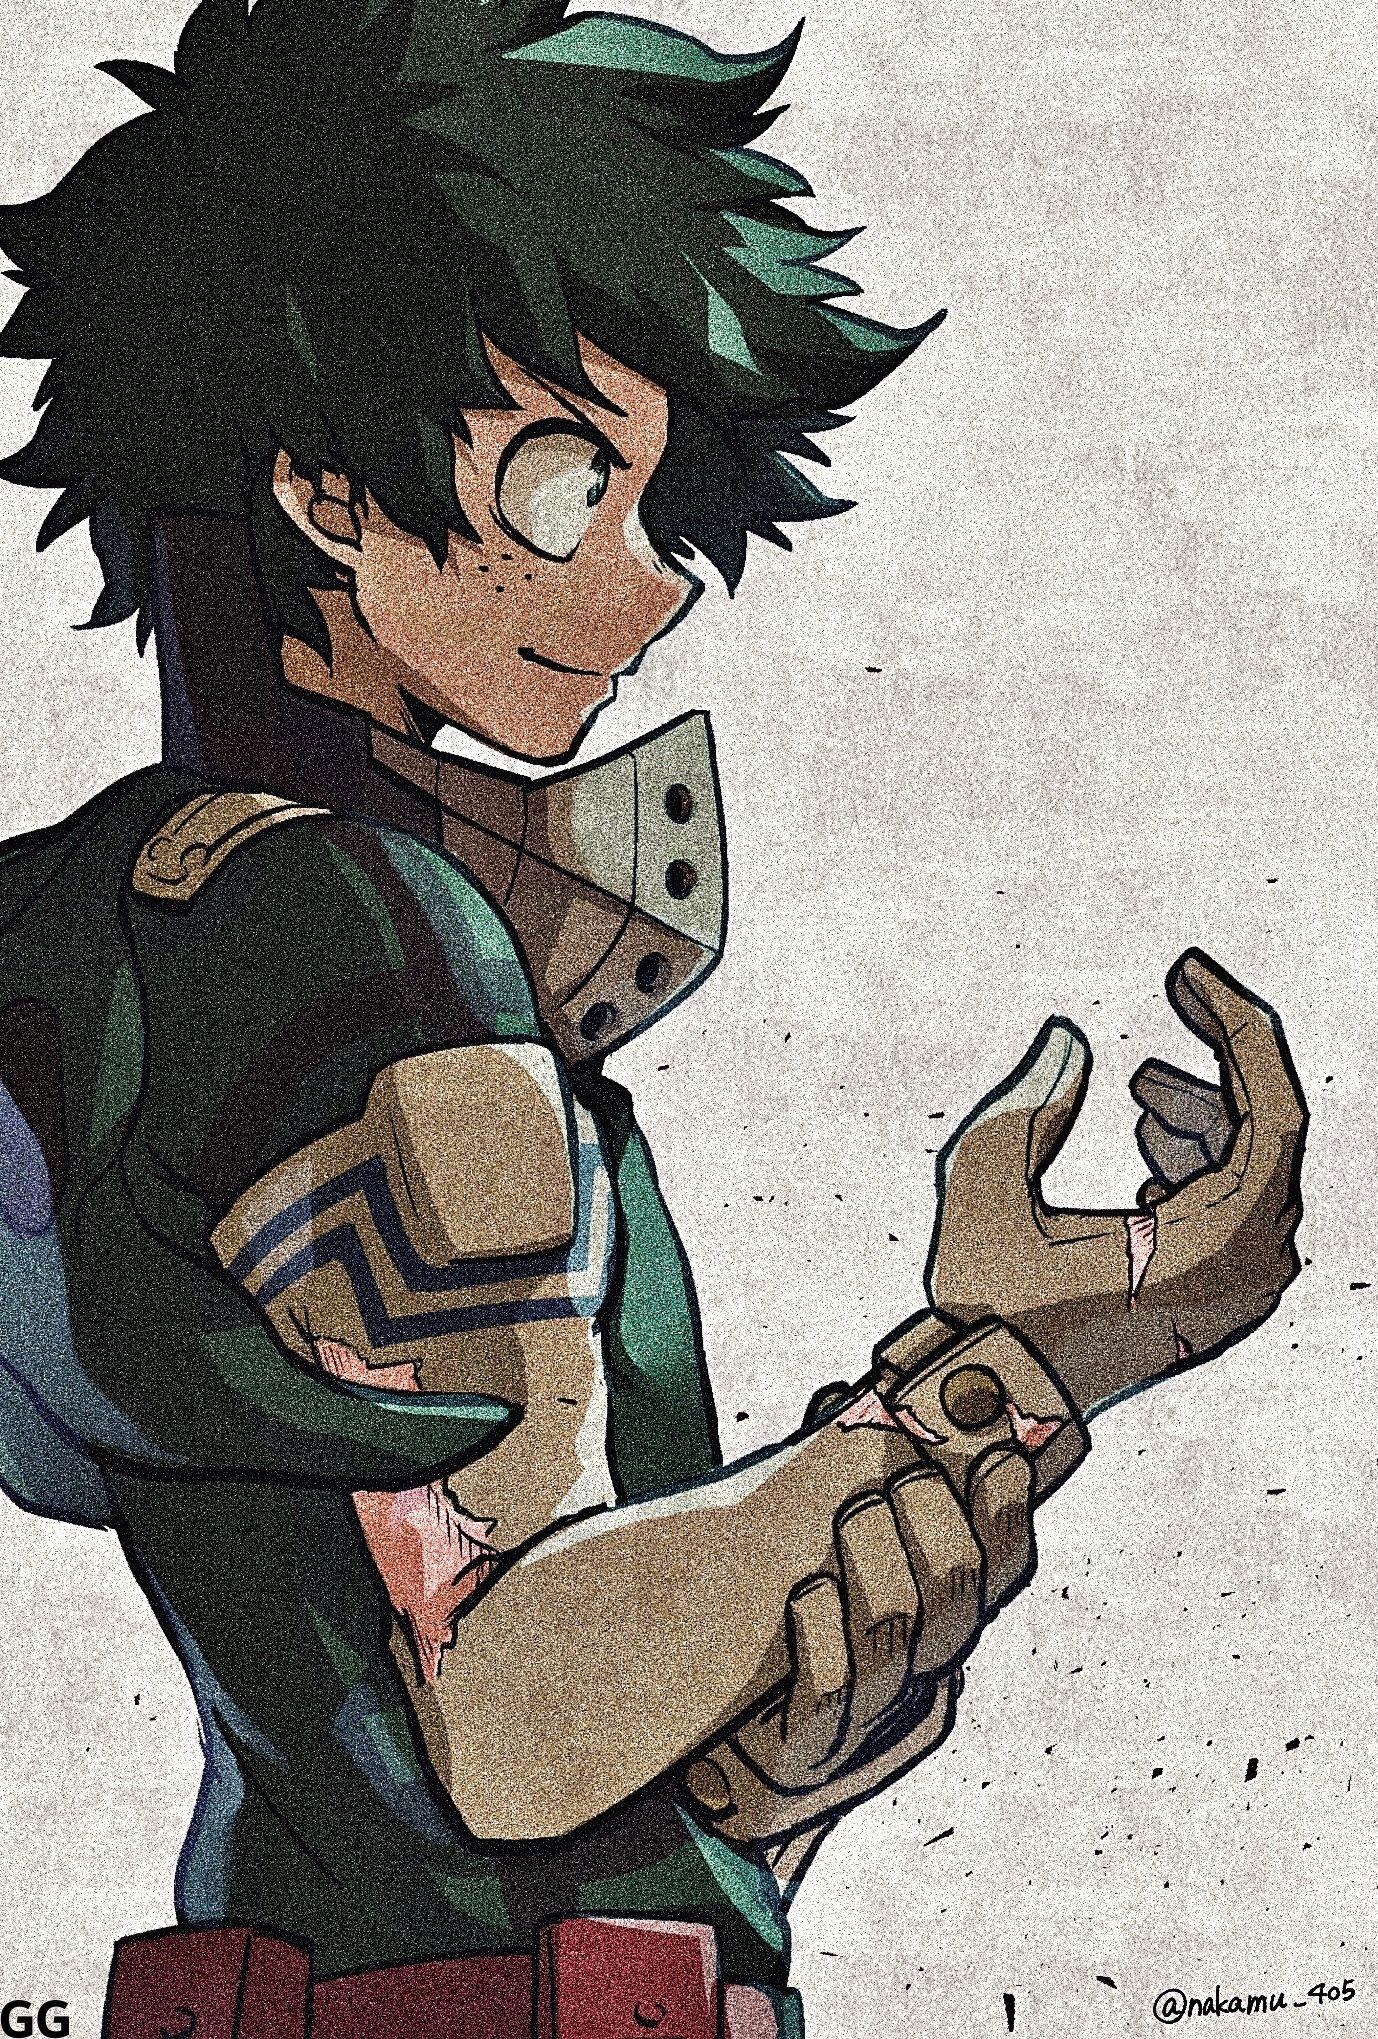 Deku My Hero Academia Wallpaper Chromebook Anime Wallpapers